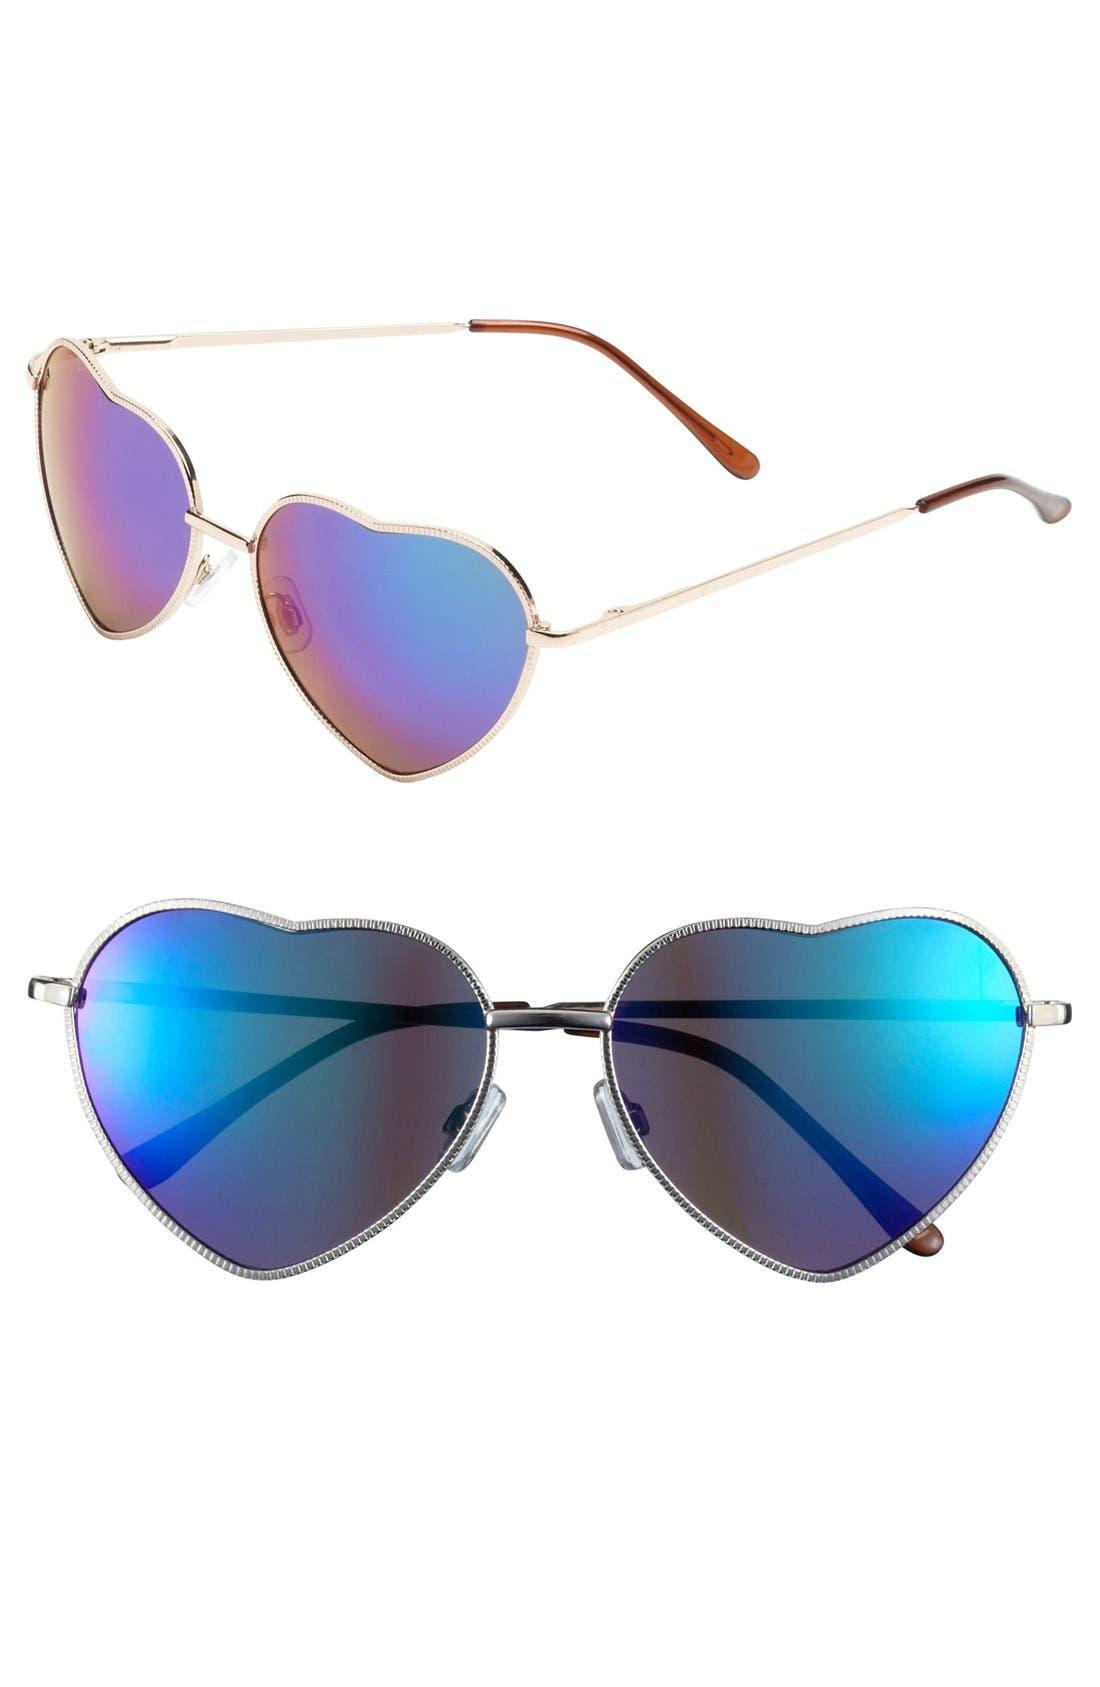 Main Image - BP. 'Flash' Heart Shaped Sunglasses